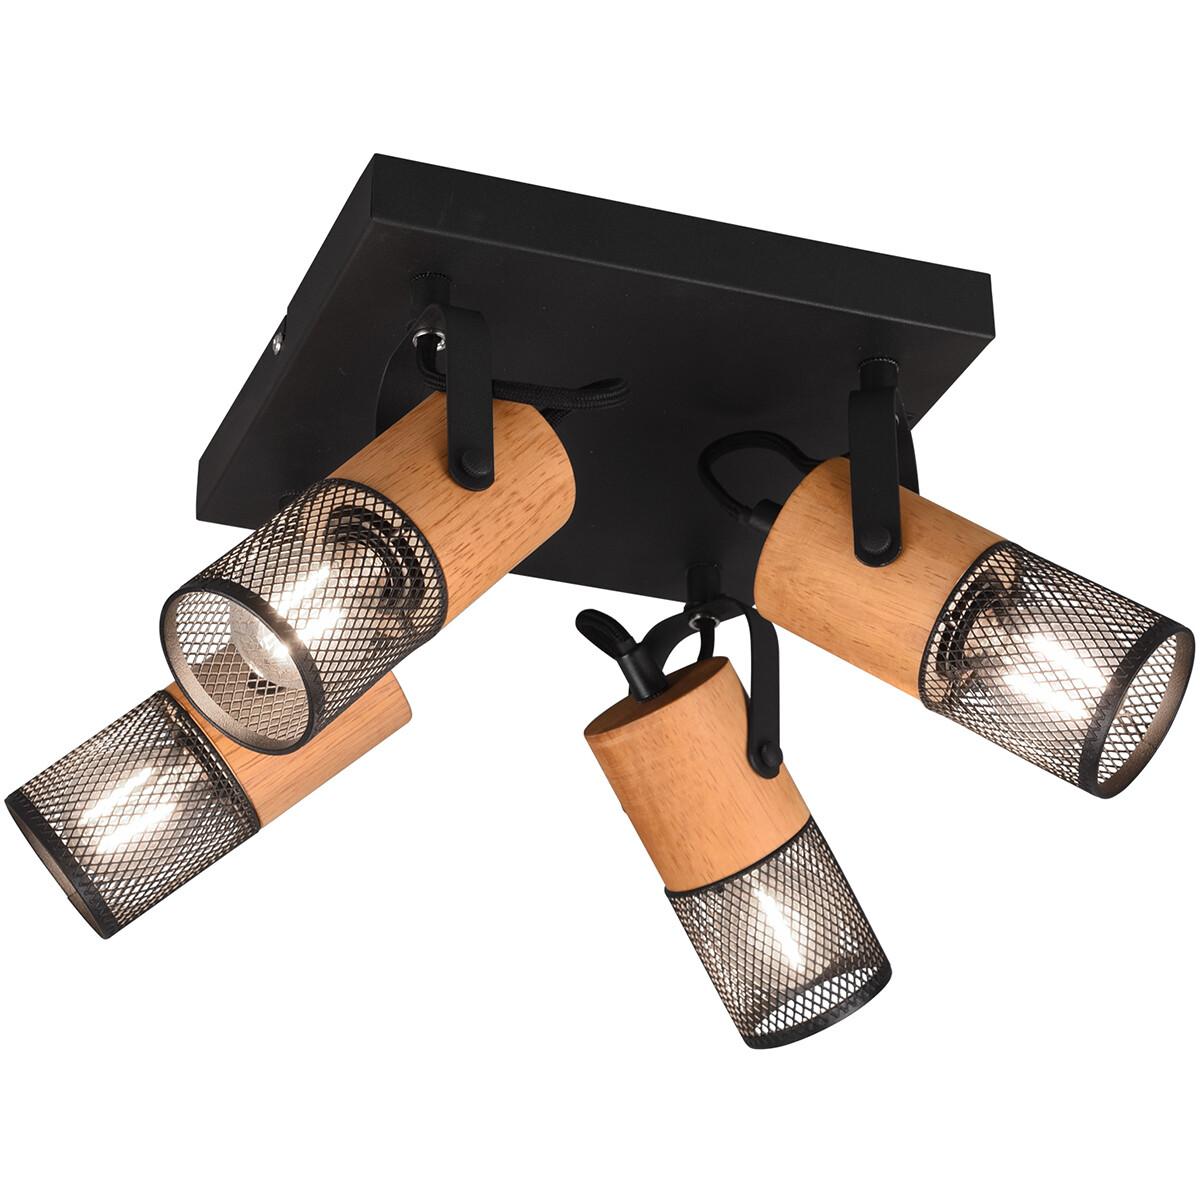 LED Plafondspot - Trion Yosh - E14 Fitting - 4-lichts - Vierkant - Mat Zwart - Aluminium